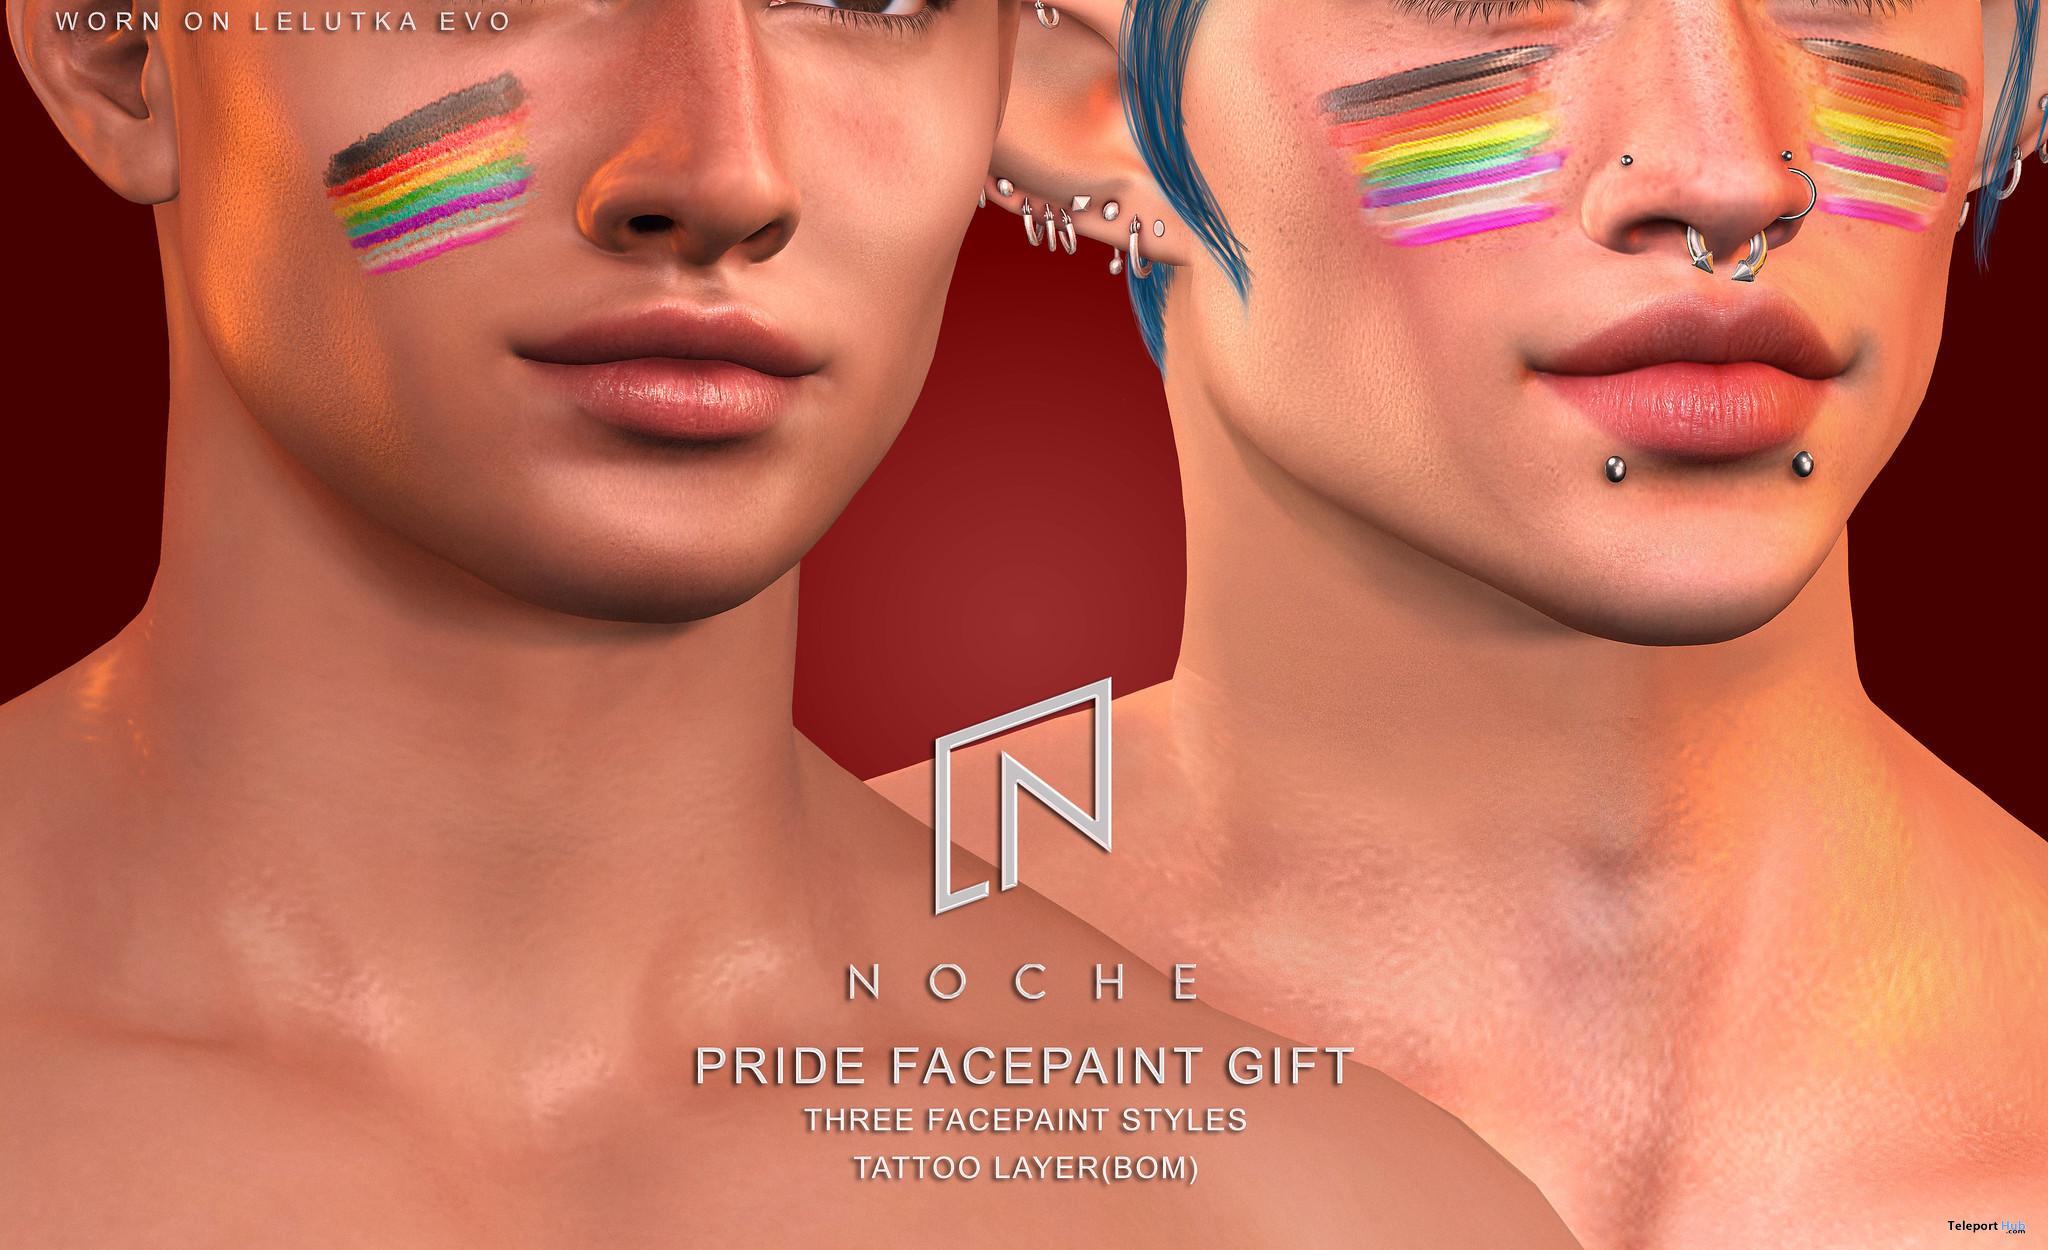 Pride Facepaint Set June 2021 Gift by Noche - Teleport Hub - teleporthub.com